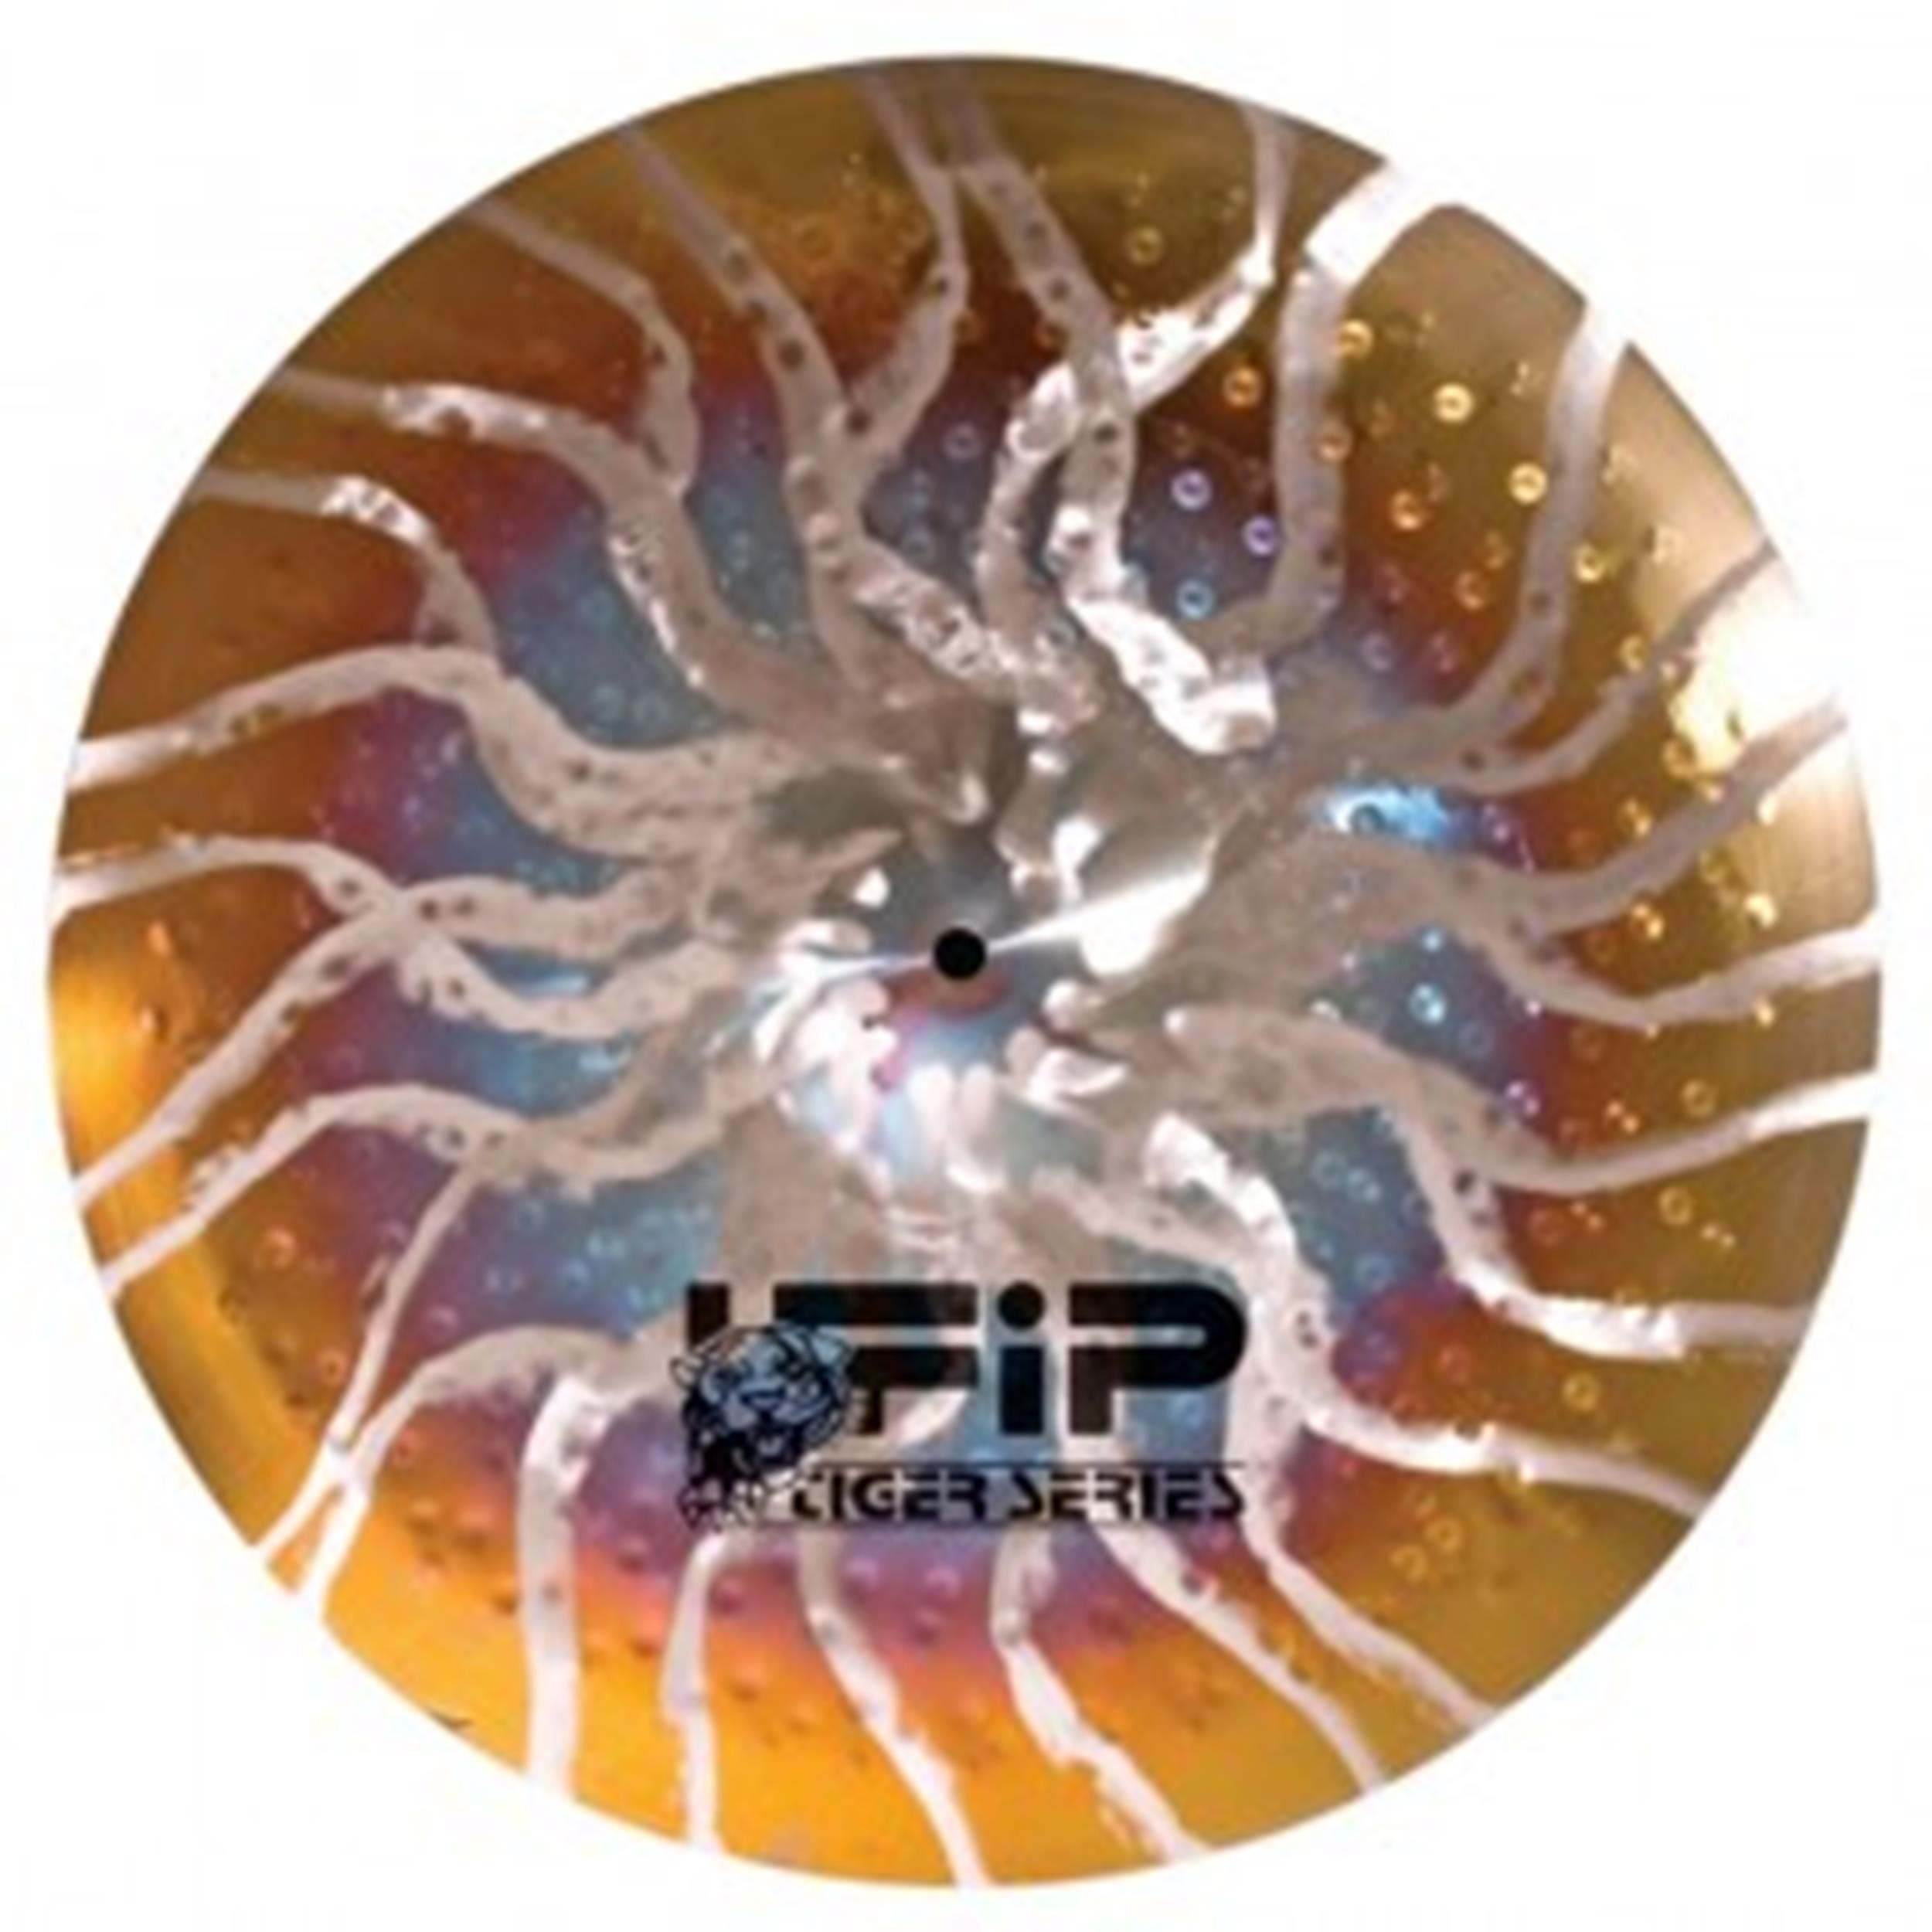 UFIP-TS-10-Tiger-Series-10-Splash-sku-45600233